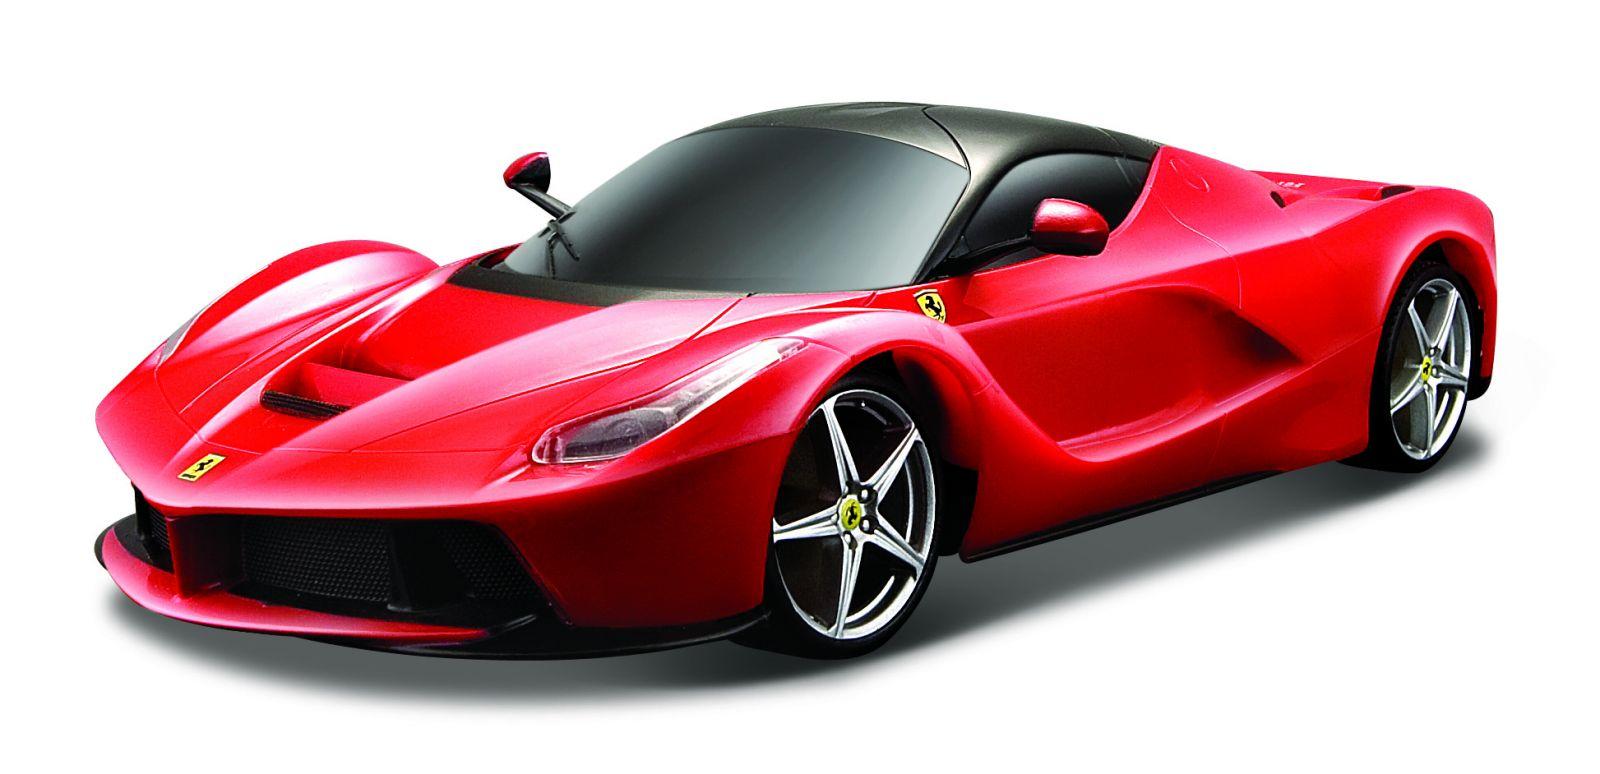 Maisto - RC Ferrari LaFerrari 1:24 - červené